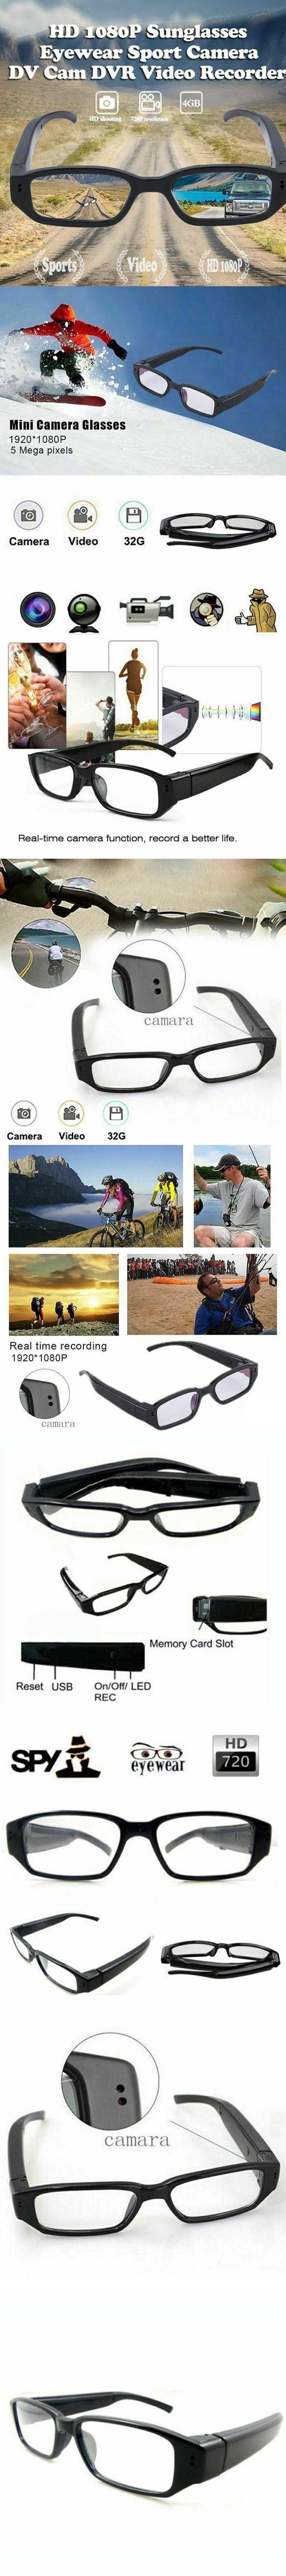 Mini HD 720P Spy Camera Glasses Hidden Eyewear DVR Video Recorder Cam Camcord GA